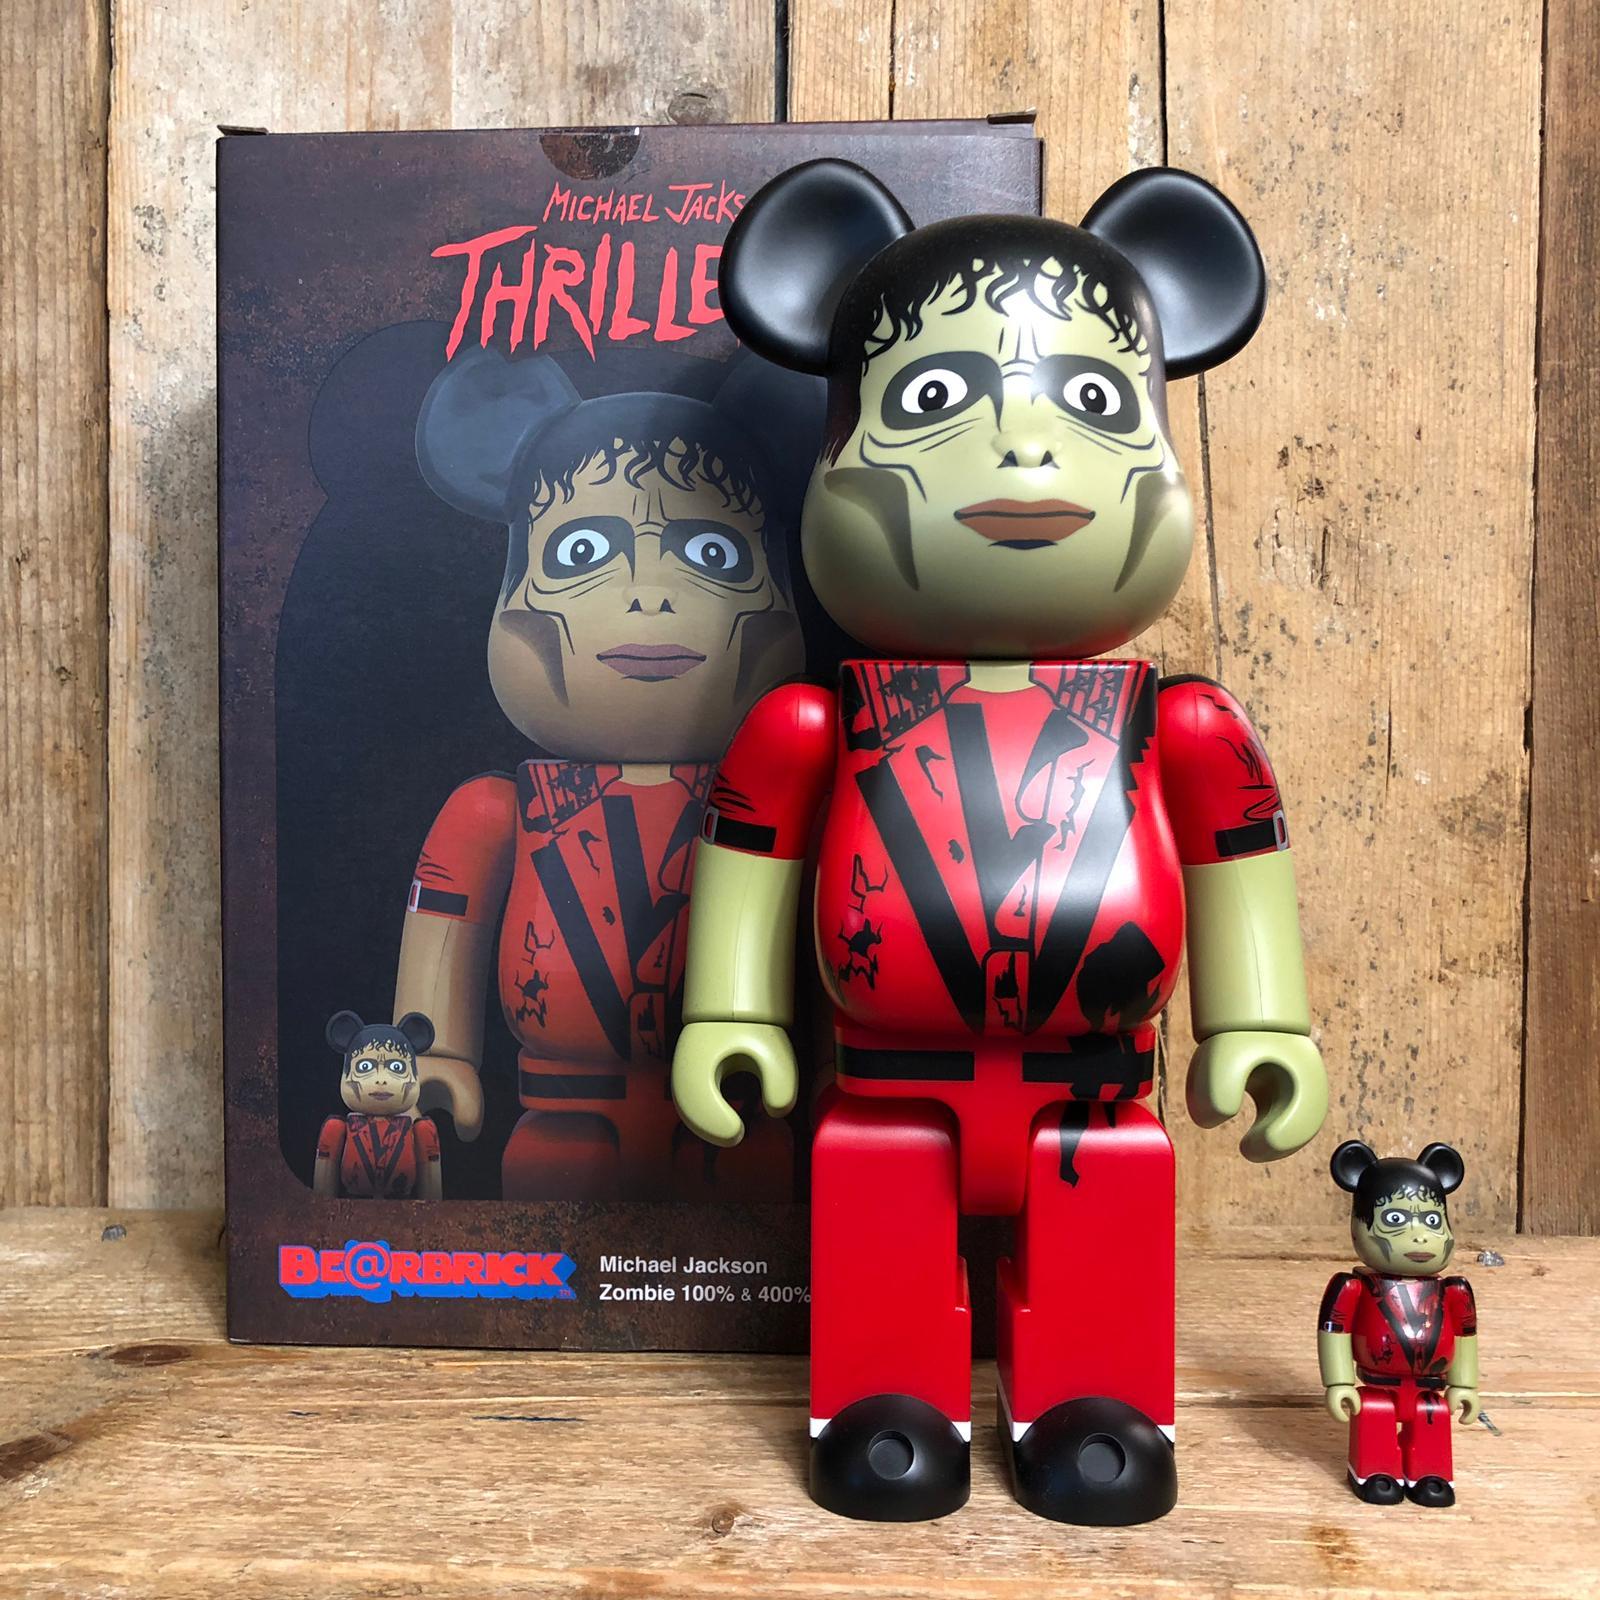 Be@rbrick Medicom Toy Michael Jackson Zombie 100% e 400%